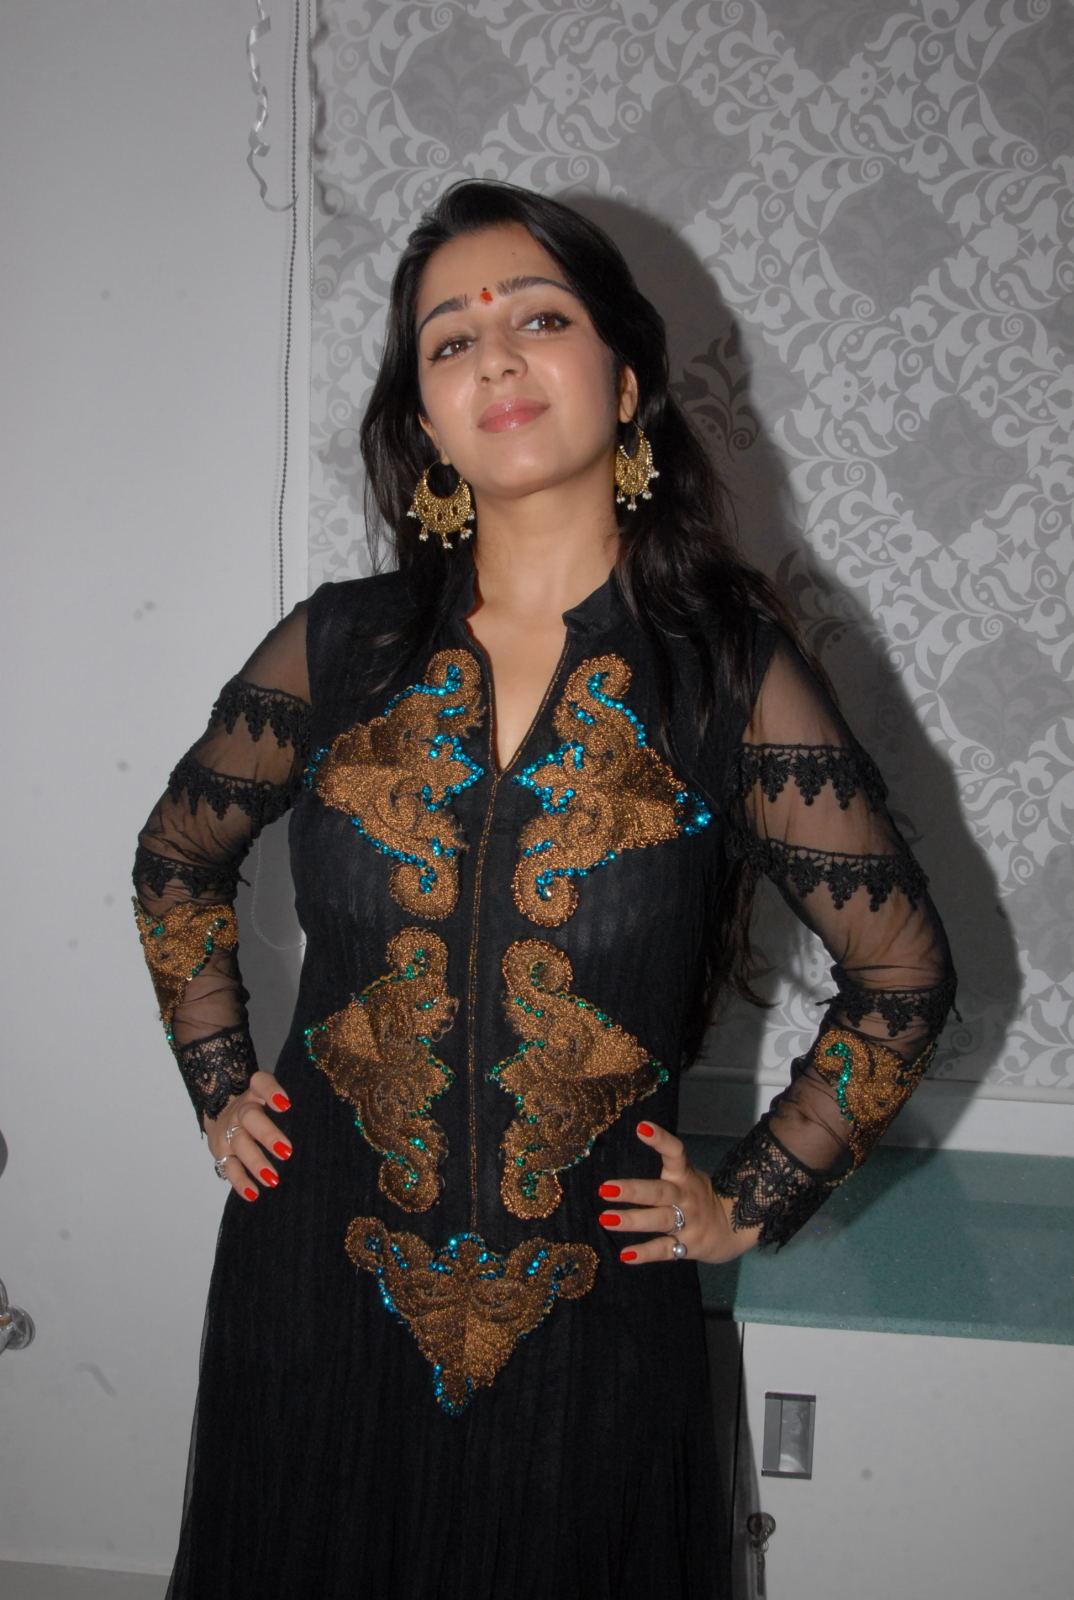 splendid hot winning Charmi new gorgeous pics at cosmetology clinic launch